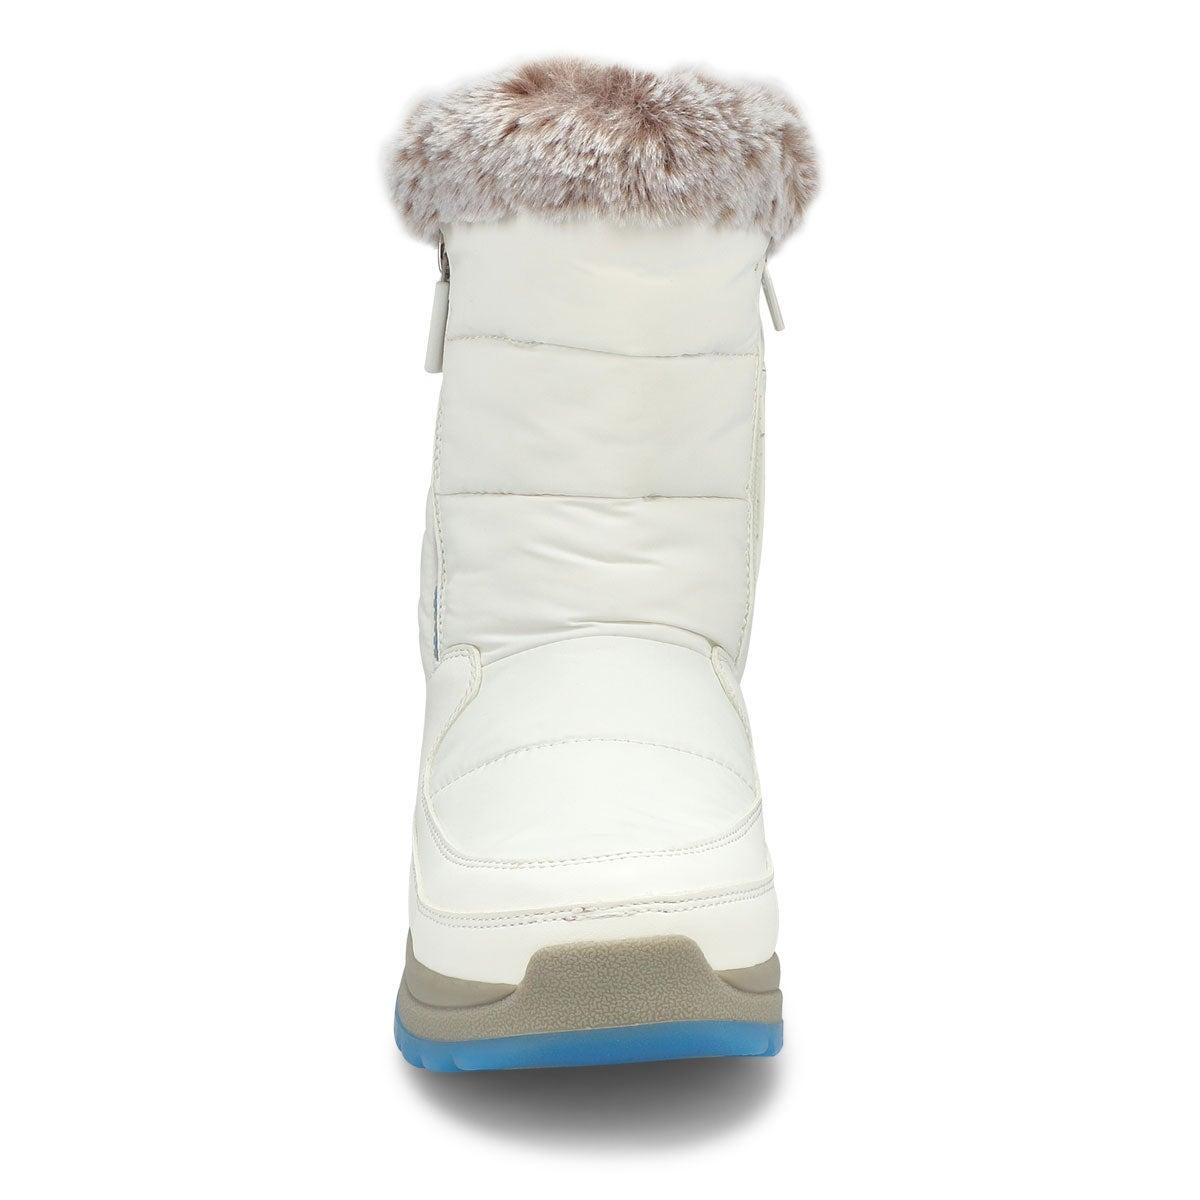 Women's SEISMIC white waterproof winter boots